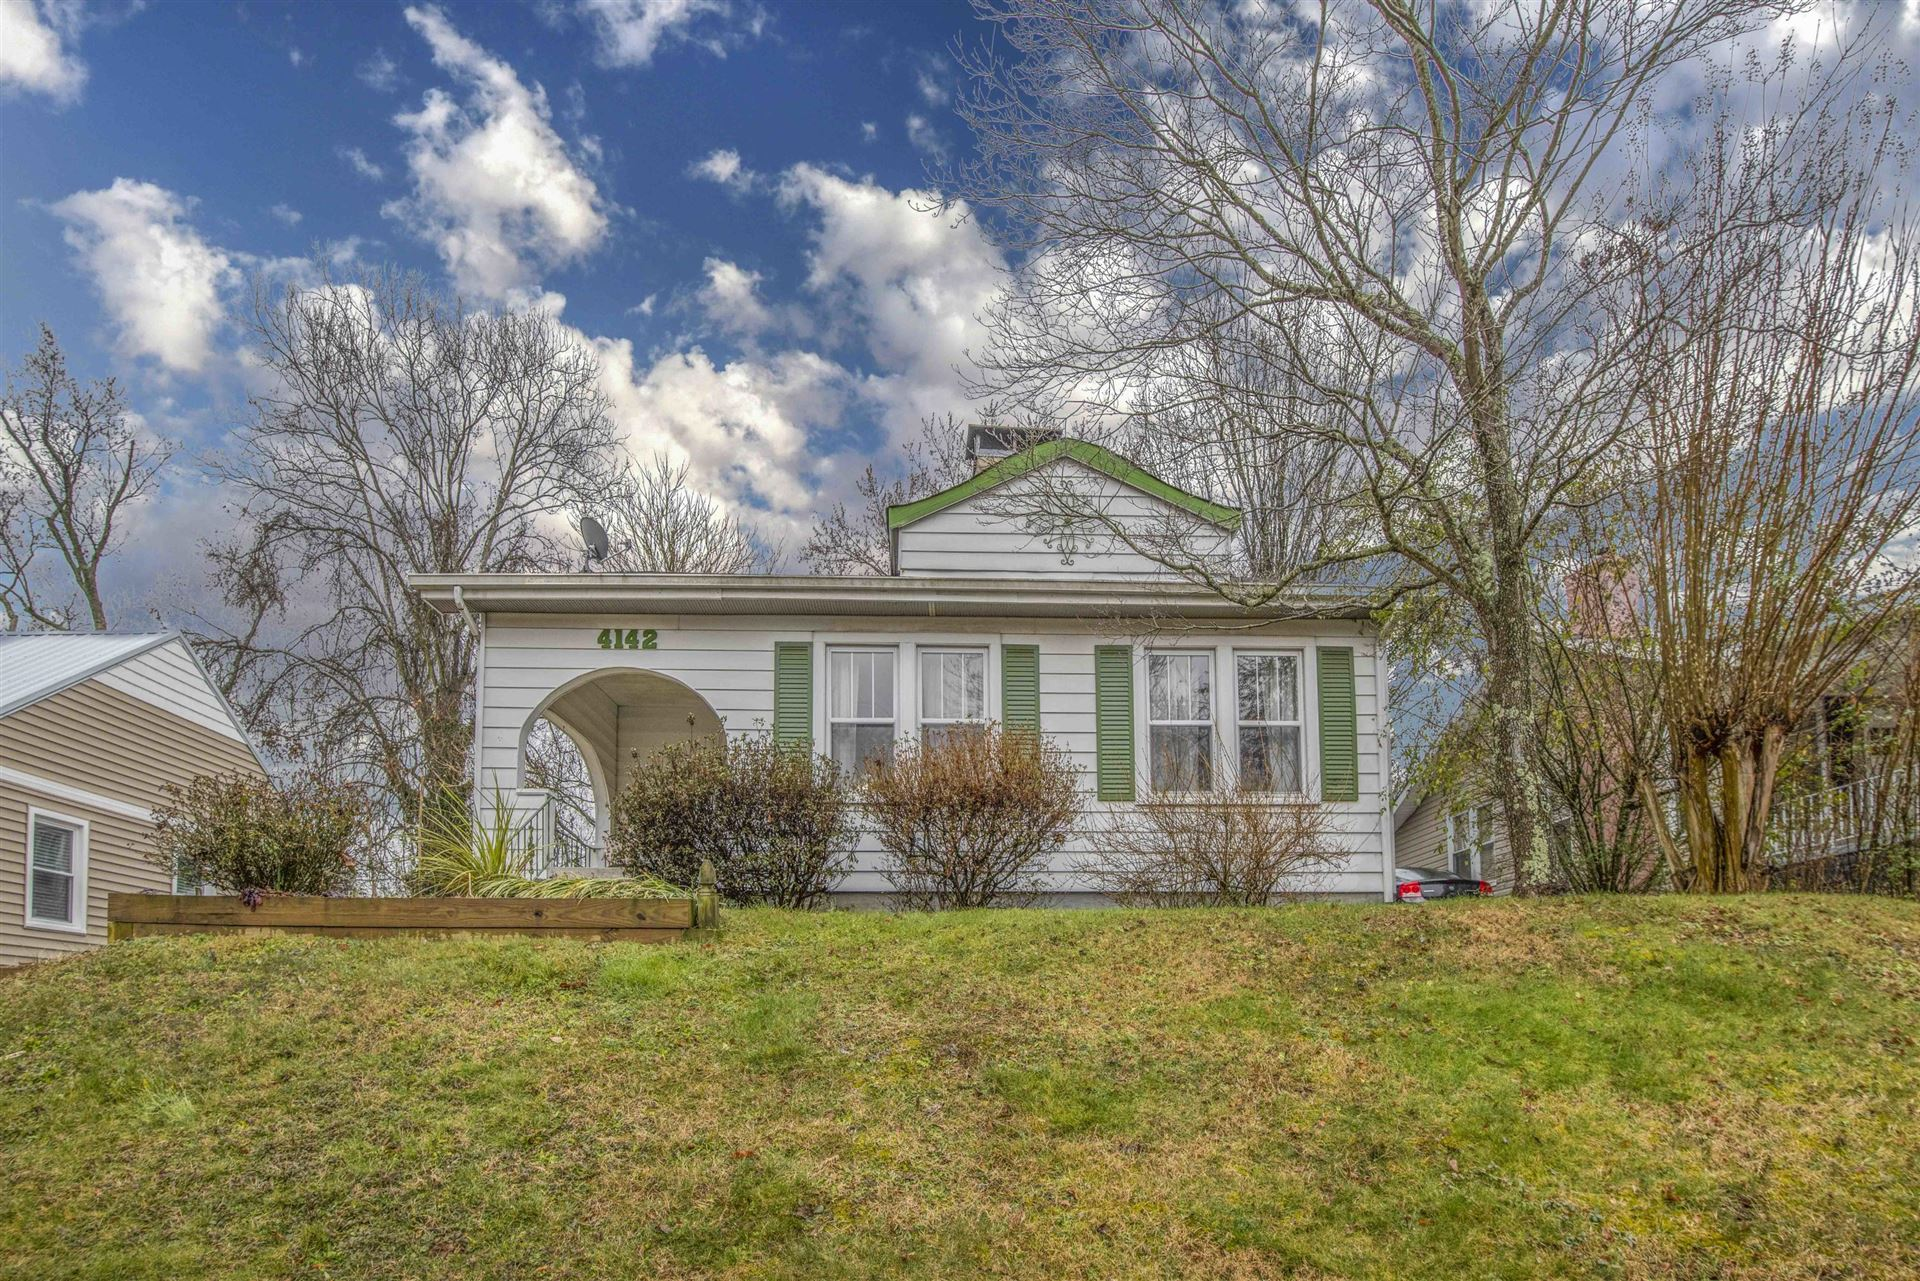 Photo of 4142 Walker Blvd, Knoxville, TN 37919 (MLS # 1140999)